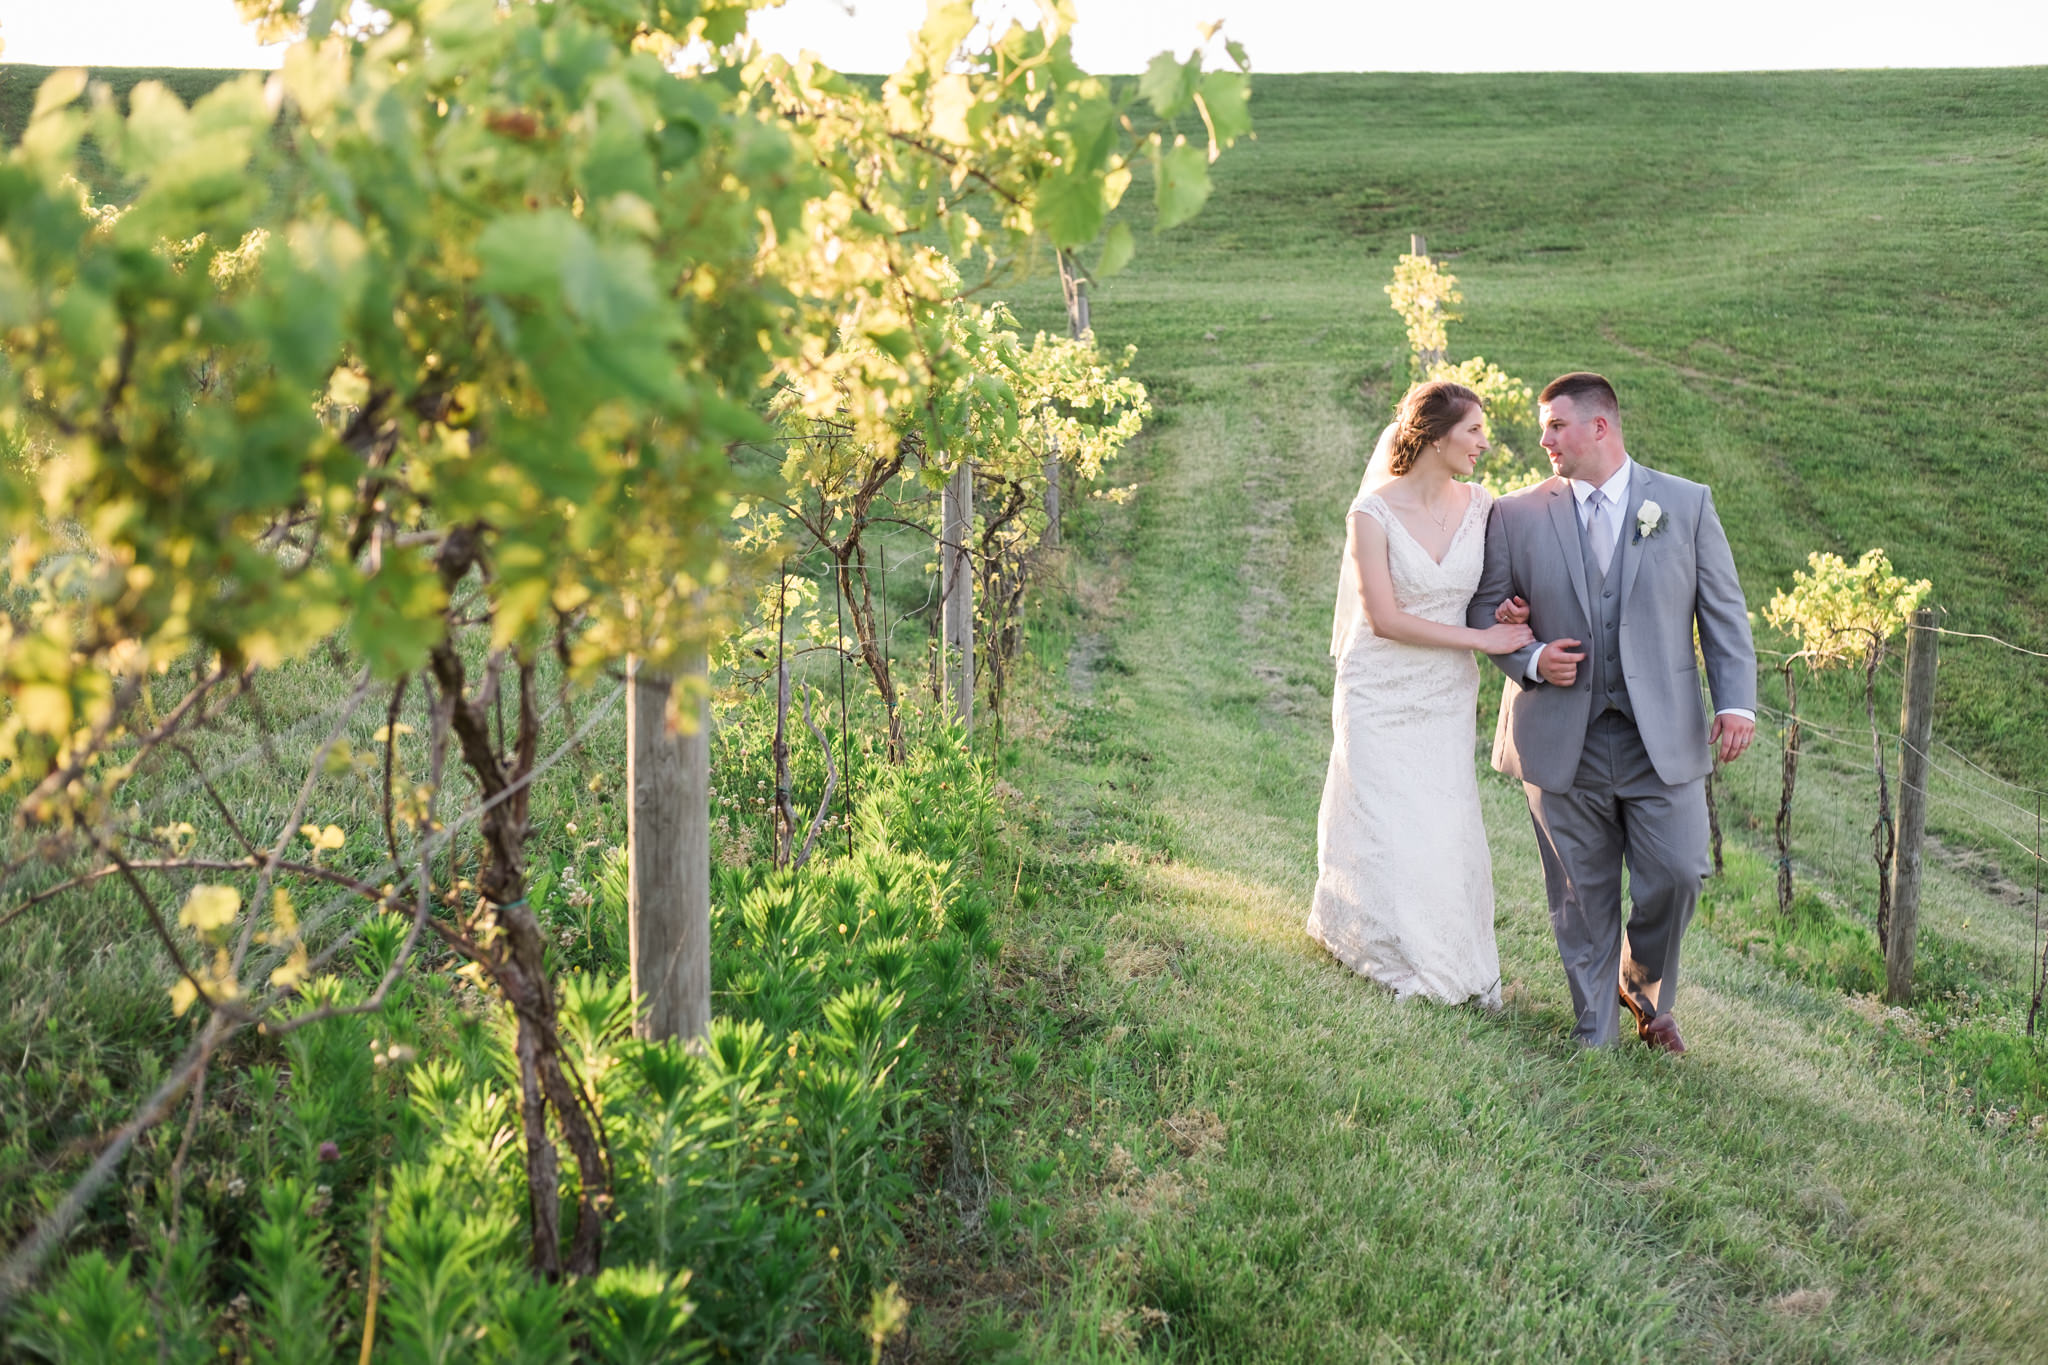 2017.06.03_Callie&Dustin_Wedding_Blog_0060.jpg